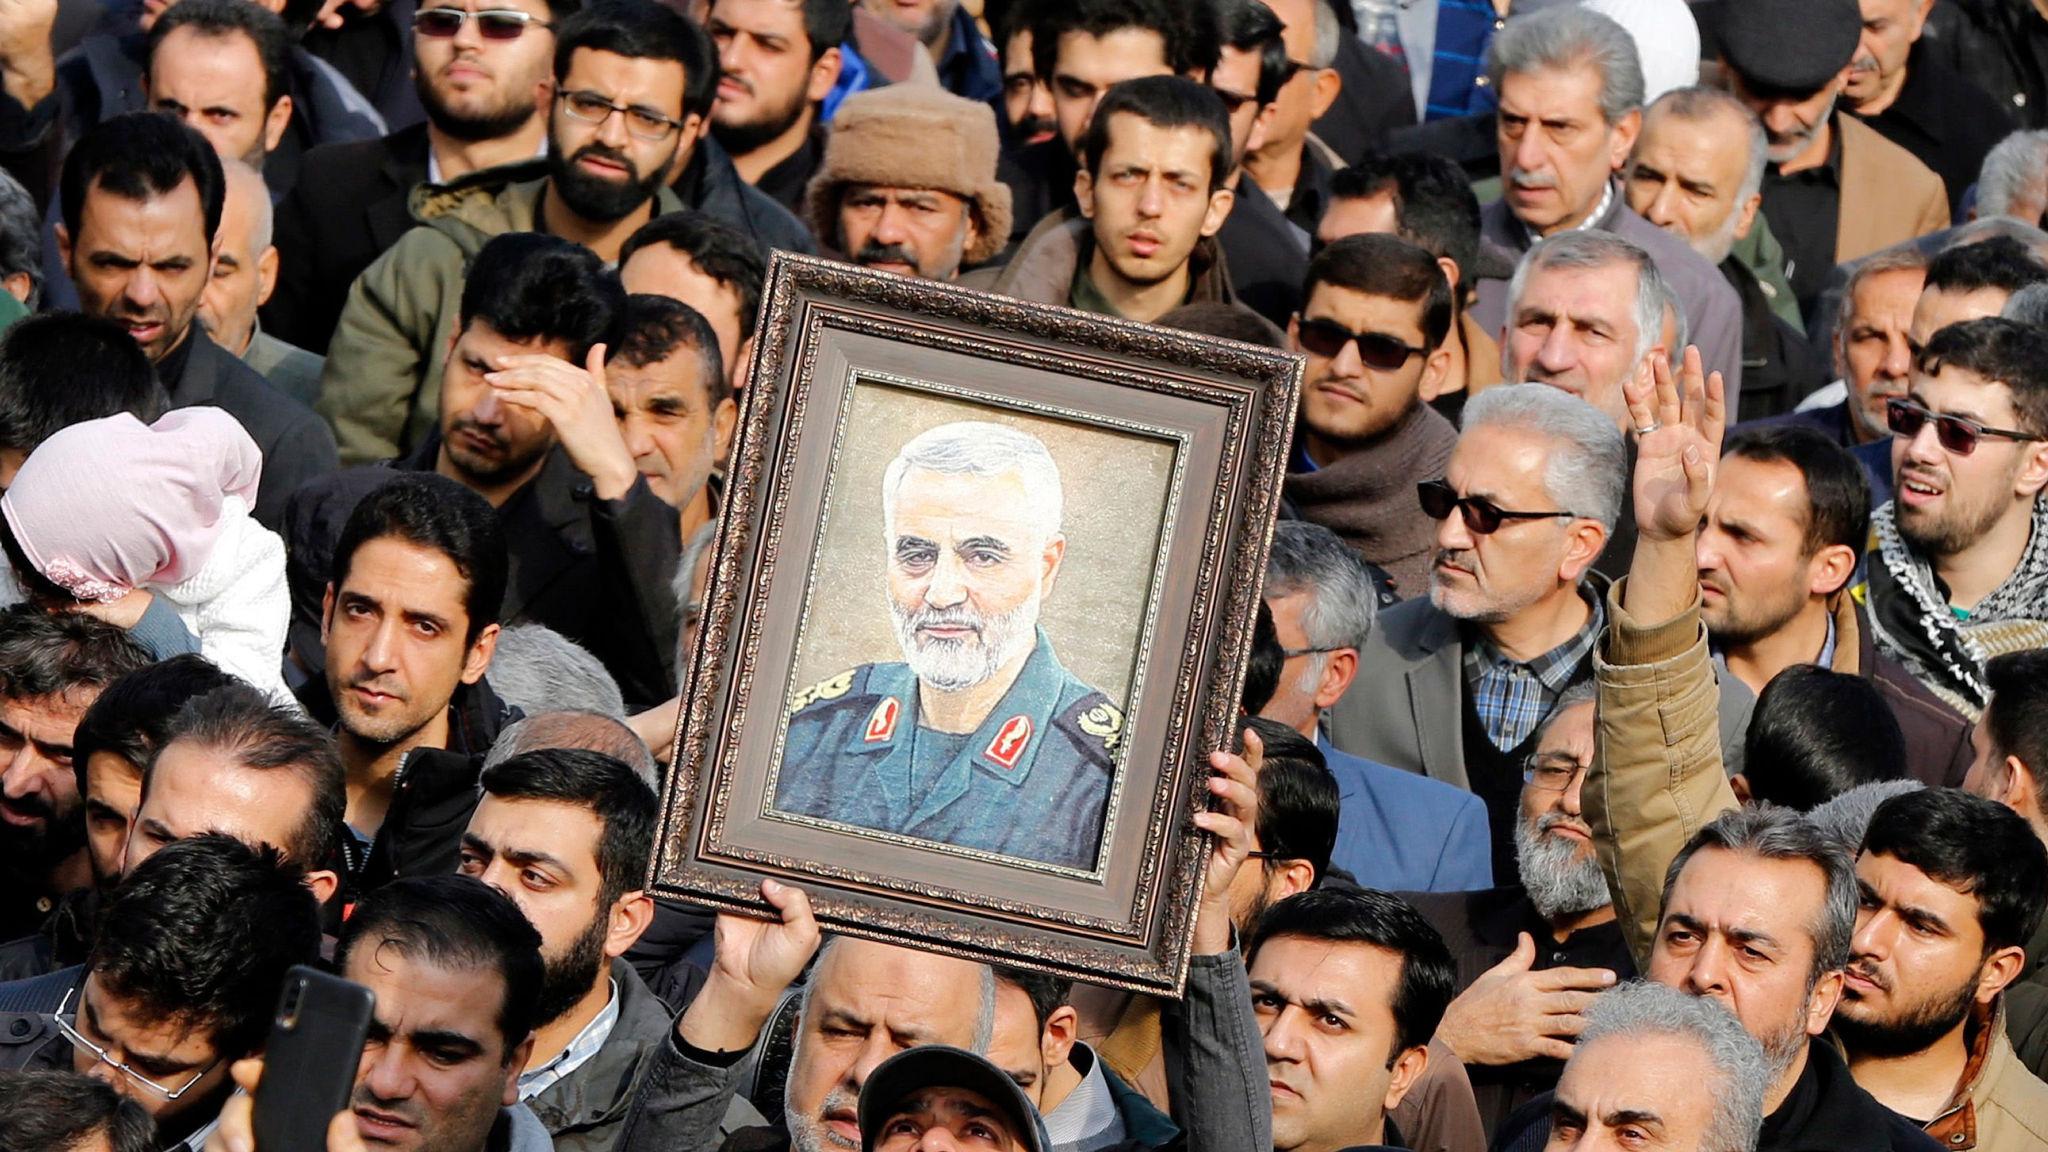 Top Iranian General Qasem Soleimani killed in US airstrike in Baghdad, Tehran, Iran Islamic Republic Of - 03 Jan 2020